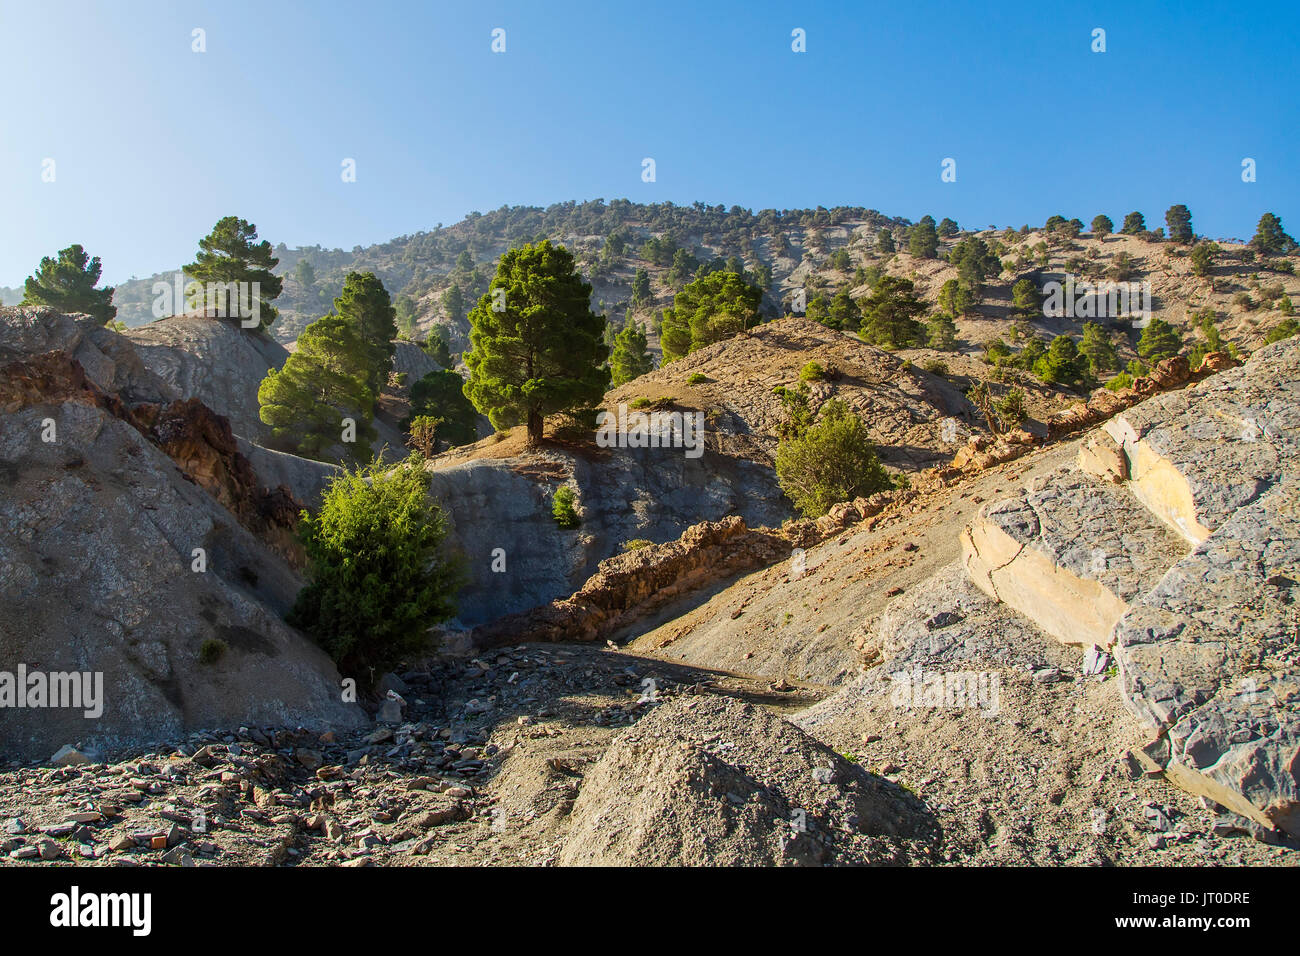 Kiefer- und Berglandschaft. Hohen Atlas. Marokko, Maghreb Nordafrika Stockbild